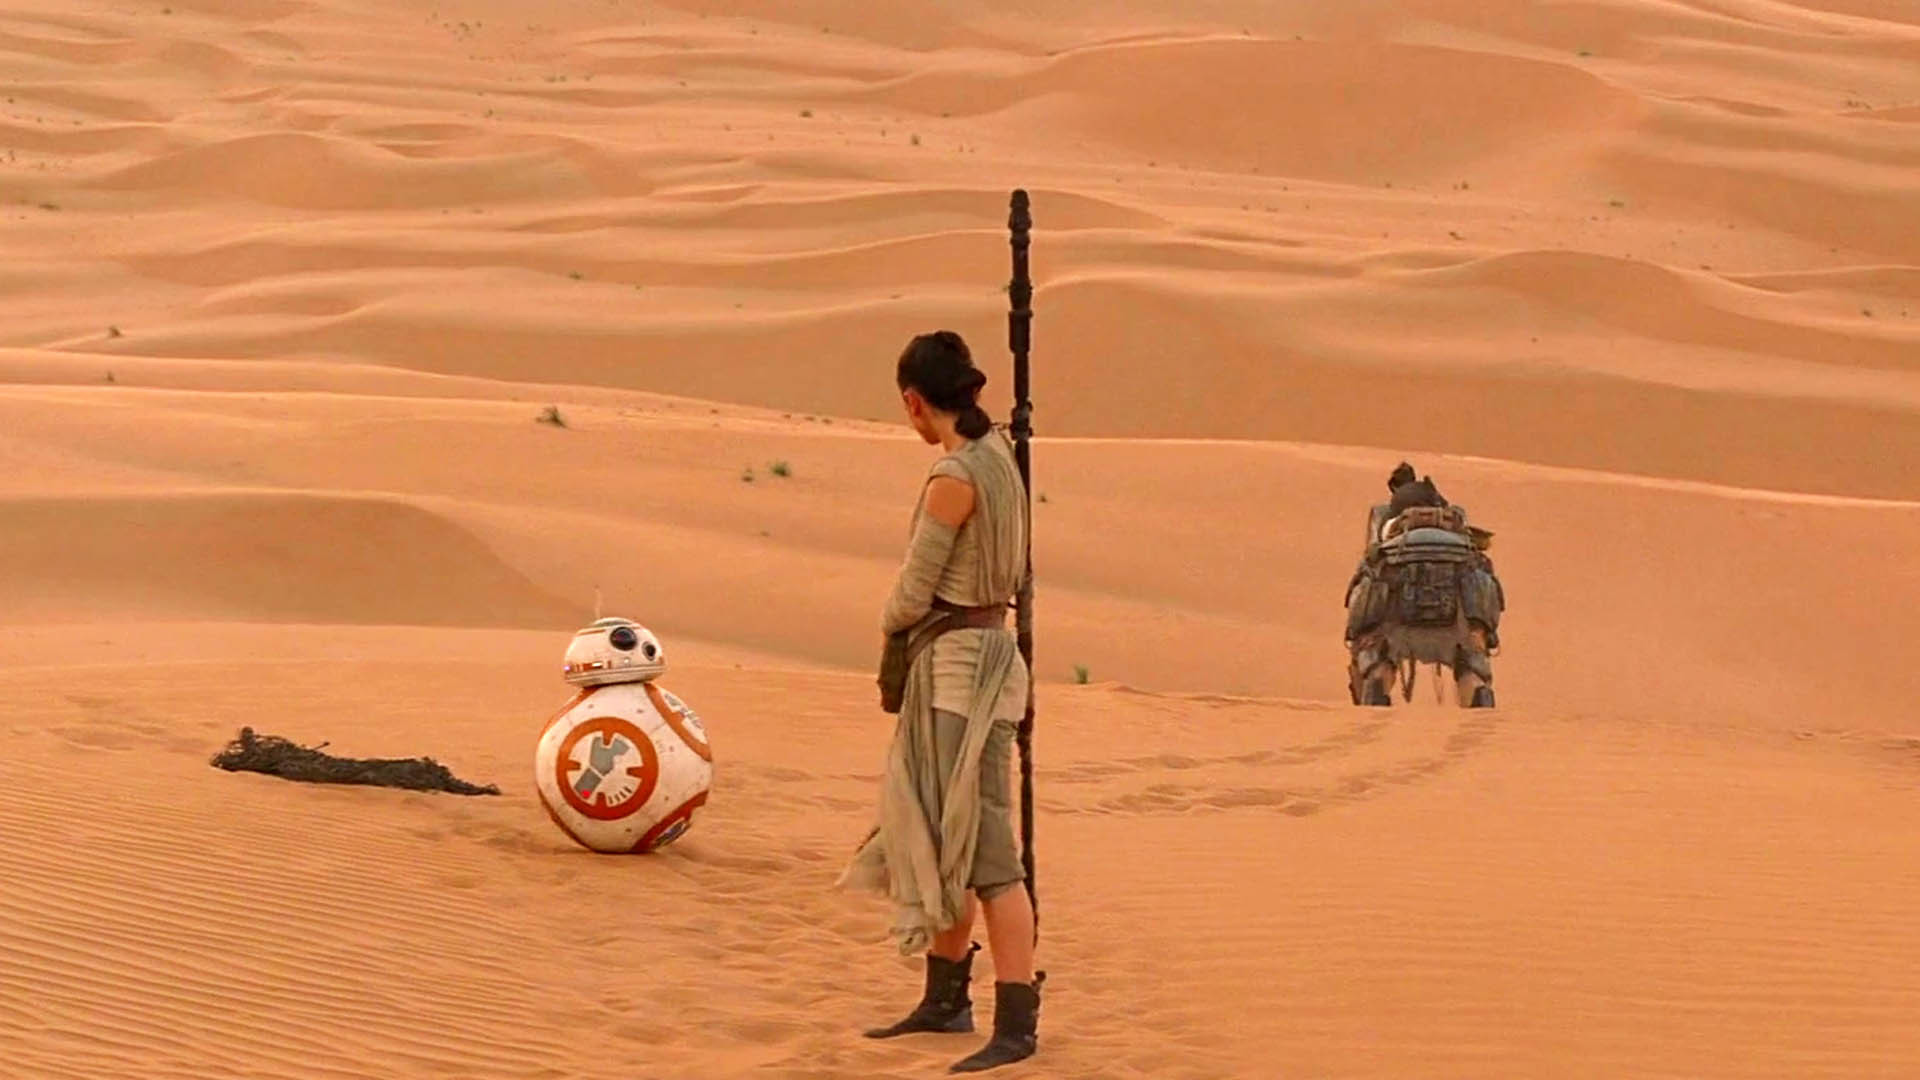 Rey encounters BB-8 – Star Wars: The Force Awakens wallpaper